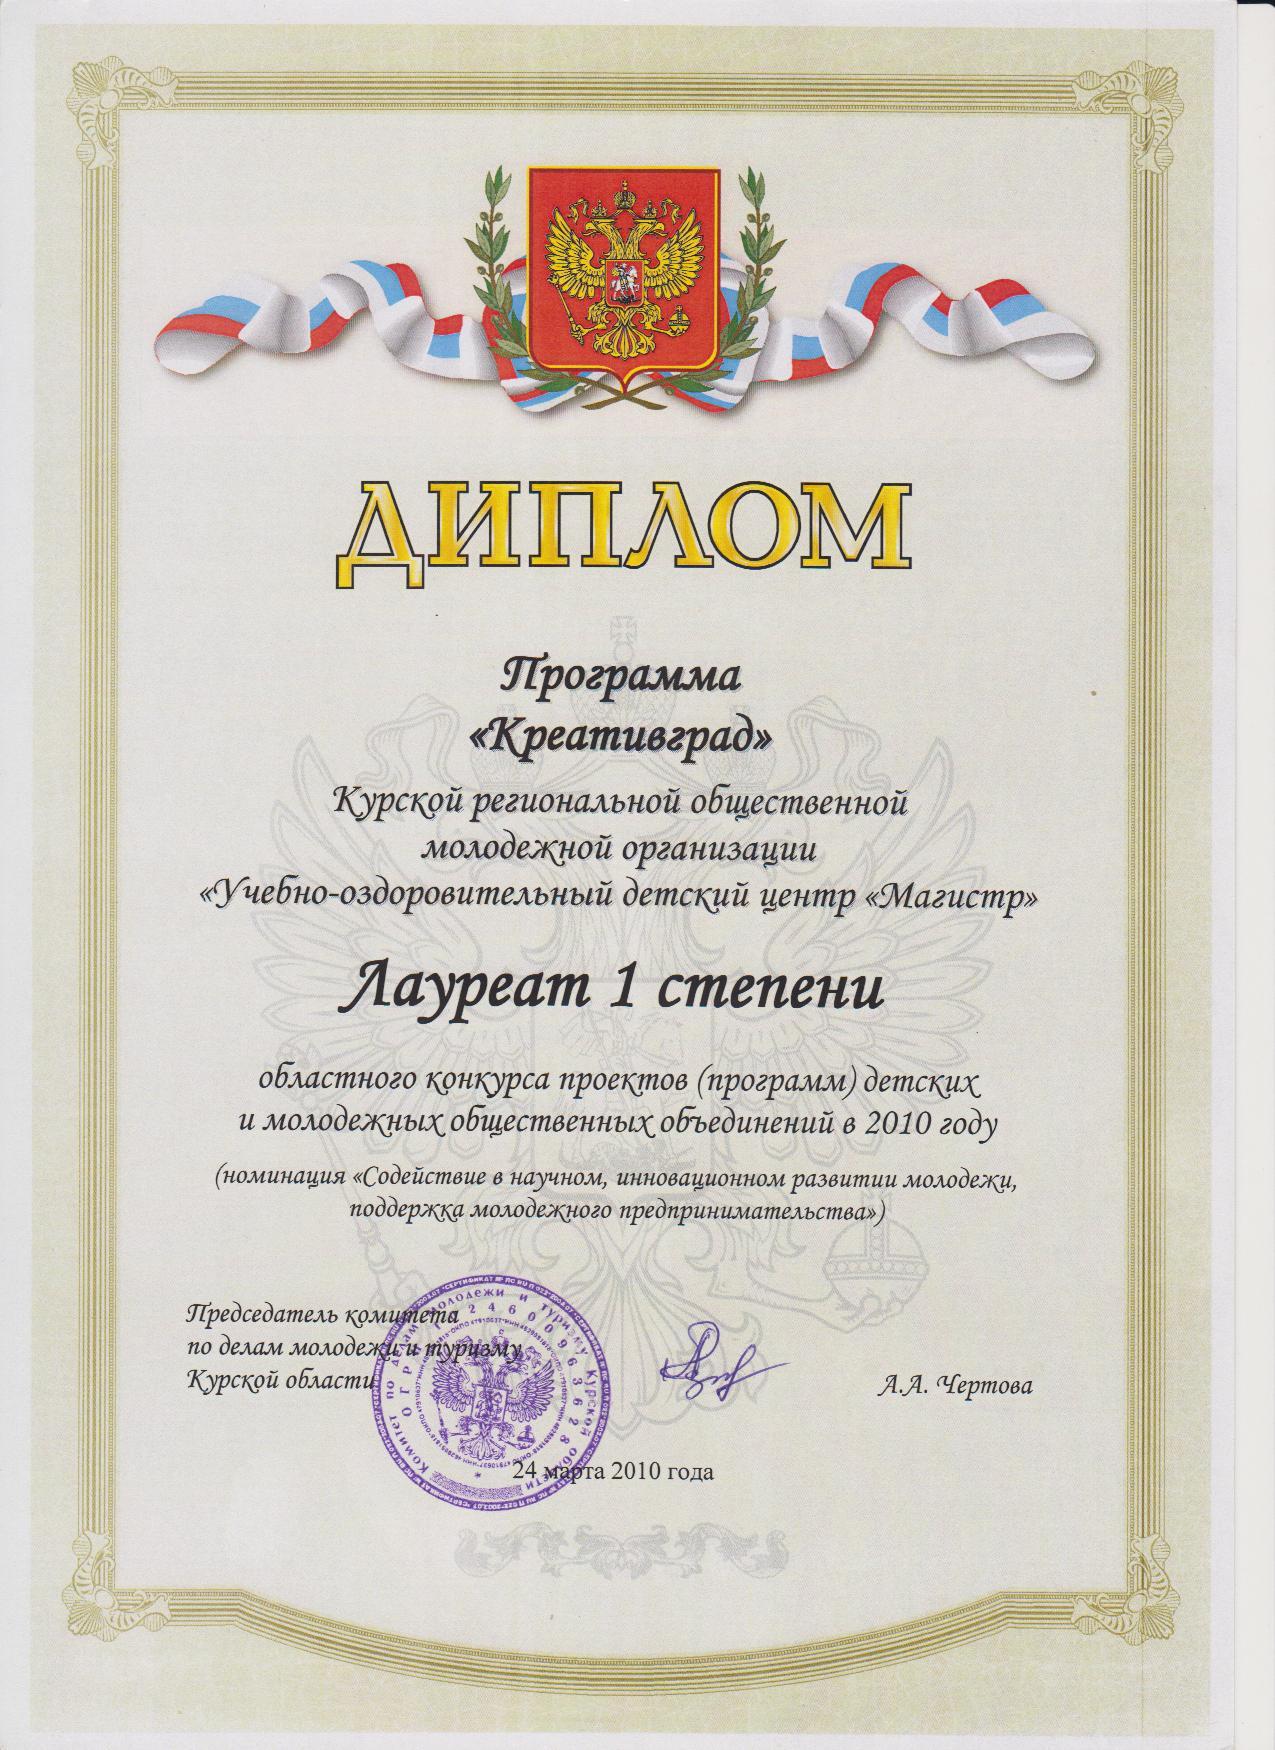 лауреат 1 ст 2010 г